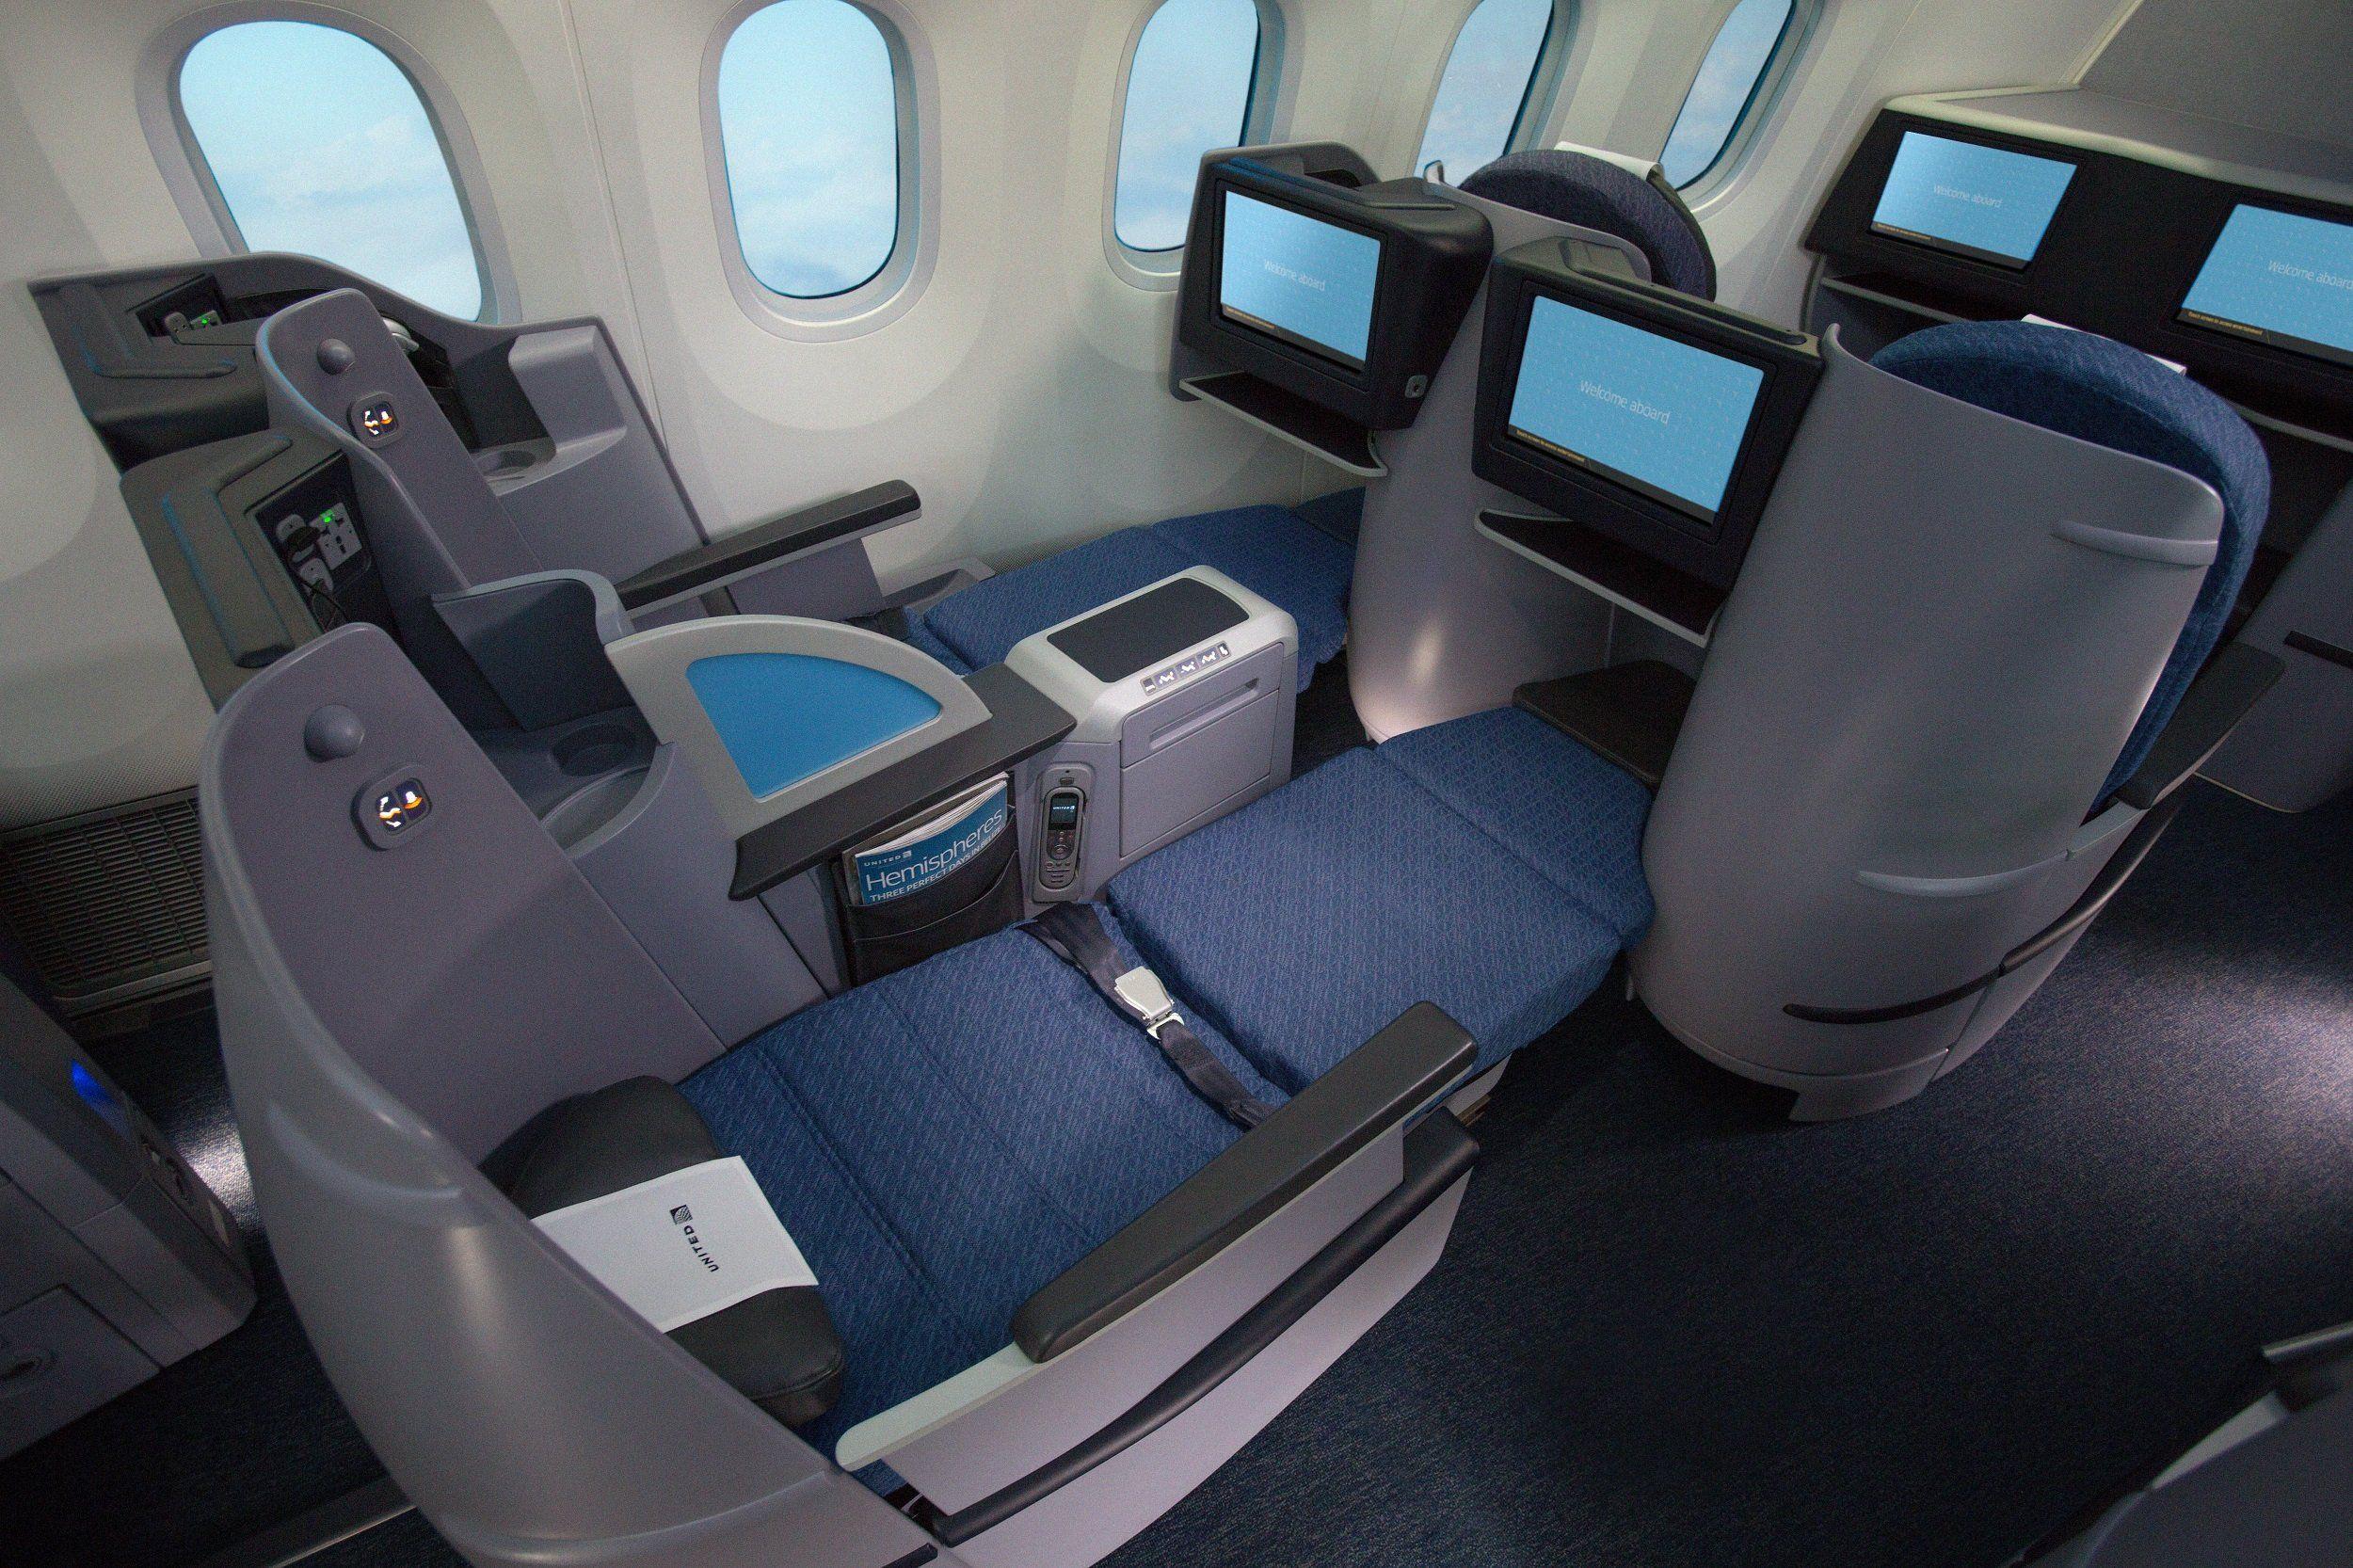 reclines vs flat bed airline GoogleSuche Suche